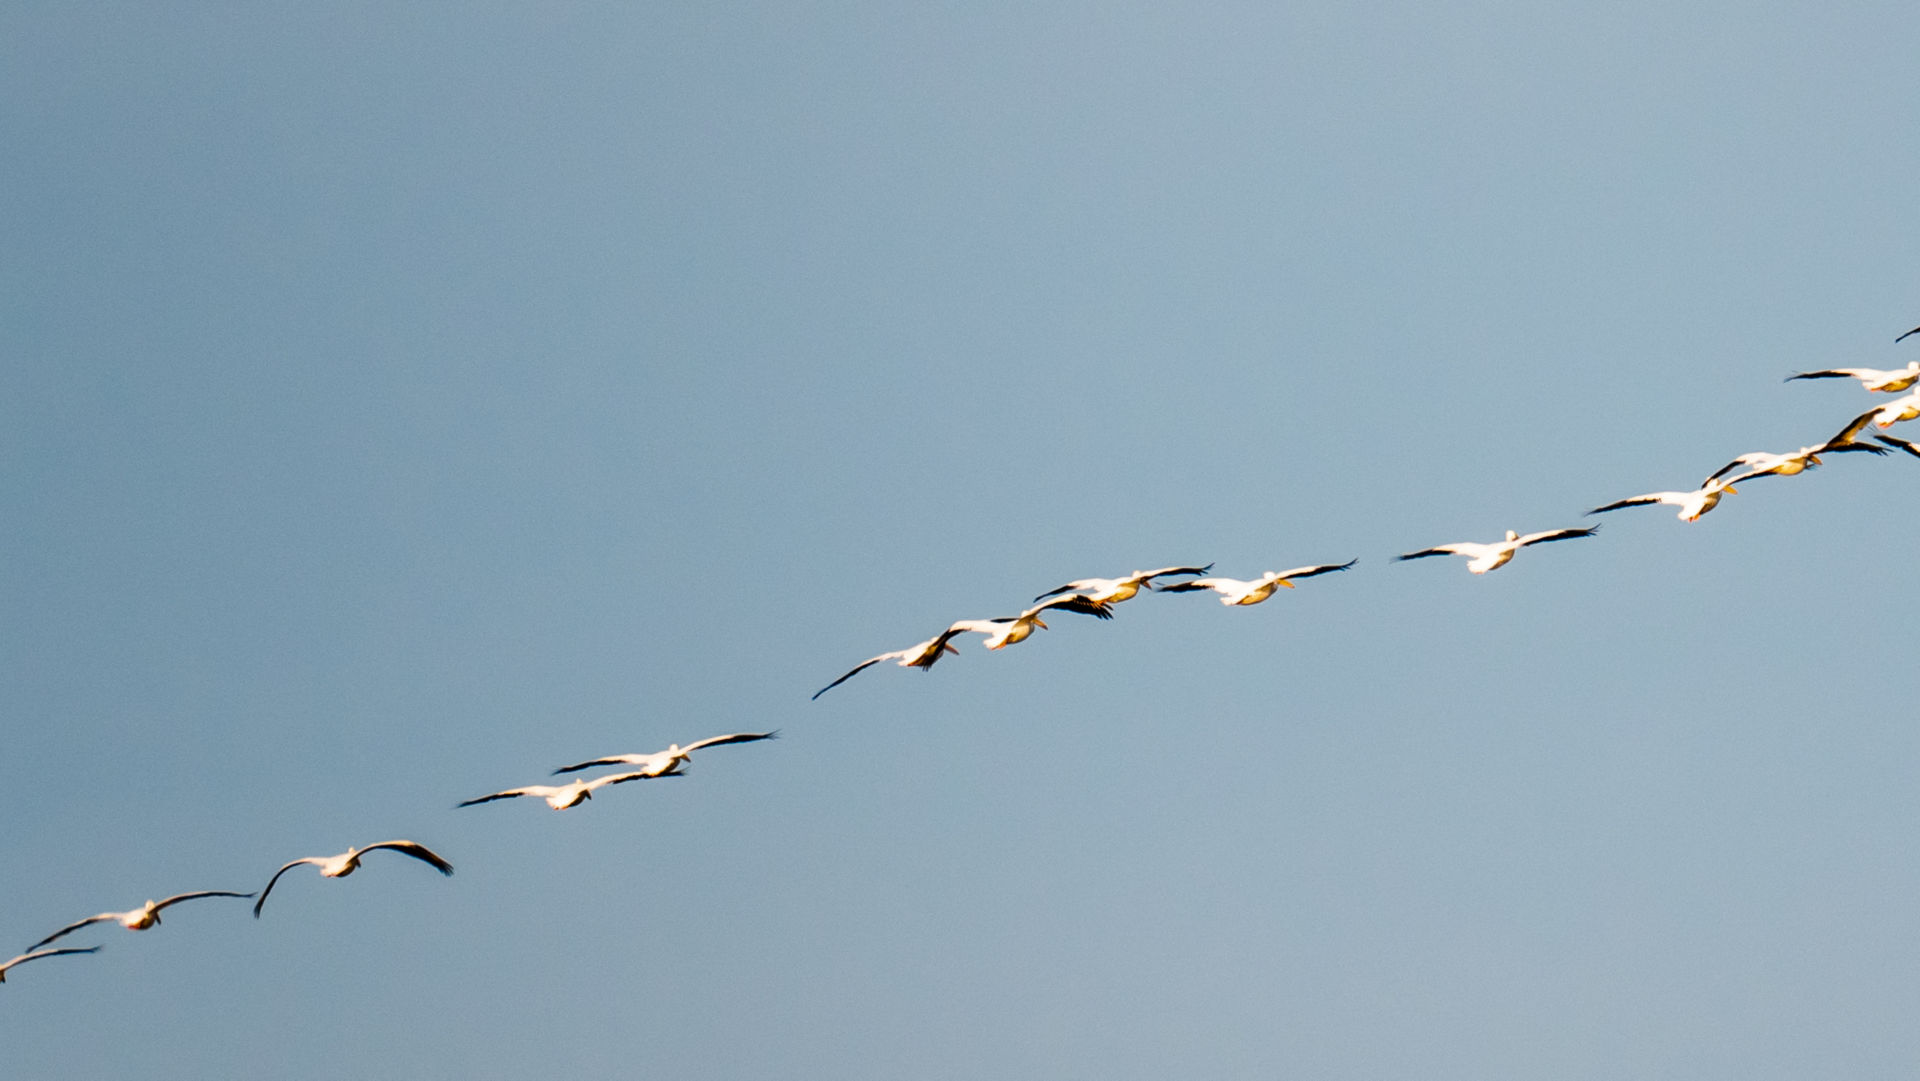 flock of birds flying in blue sky